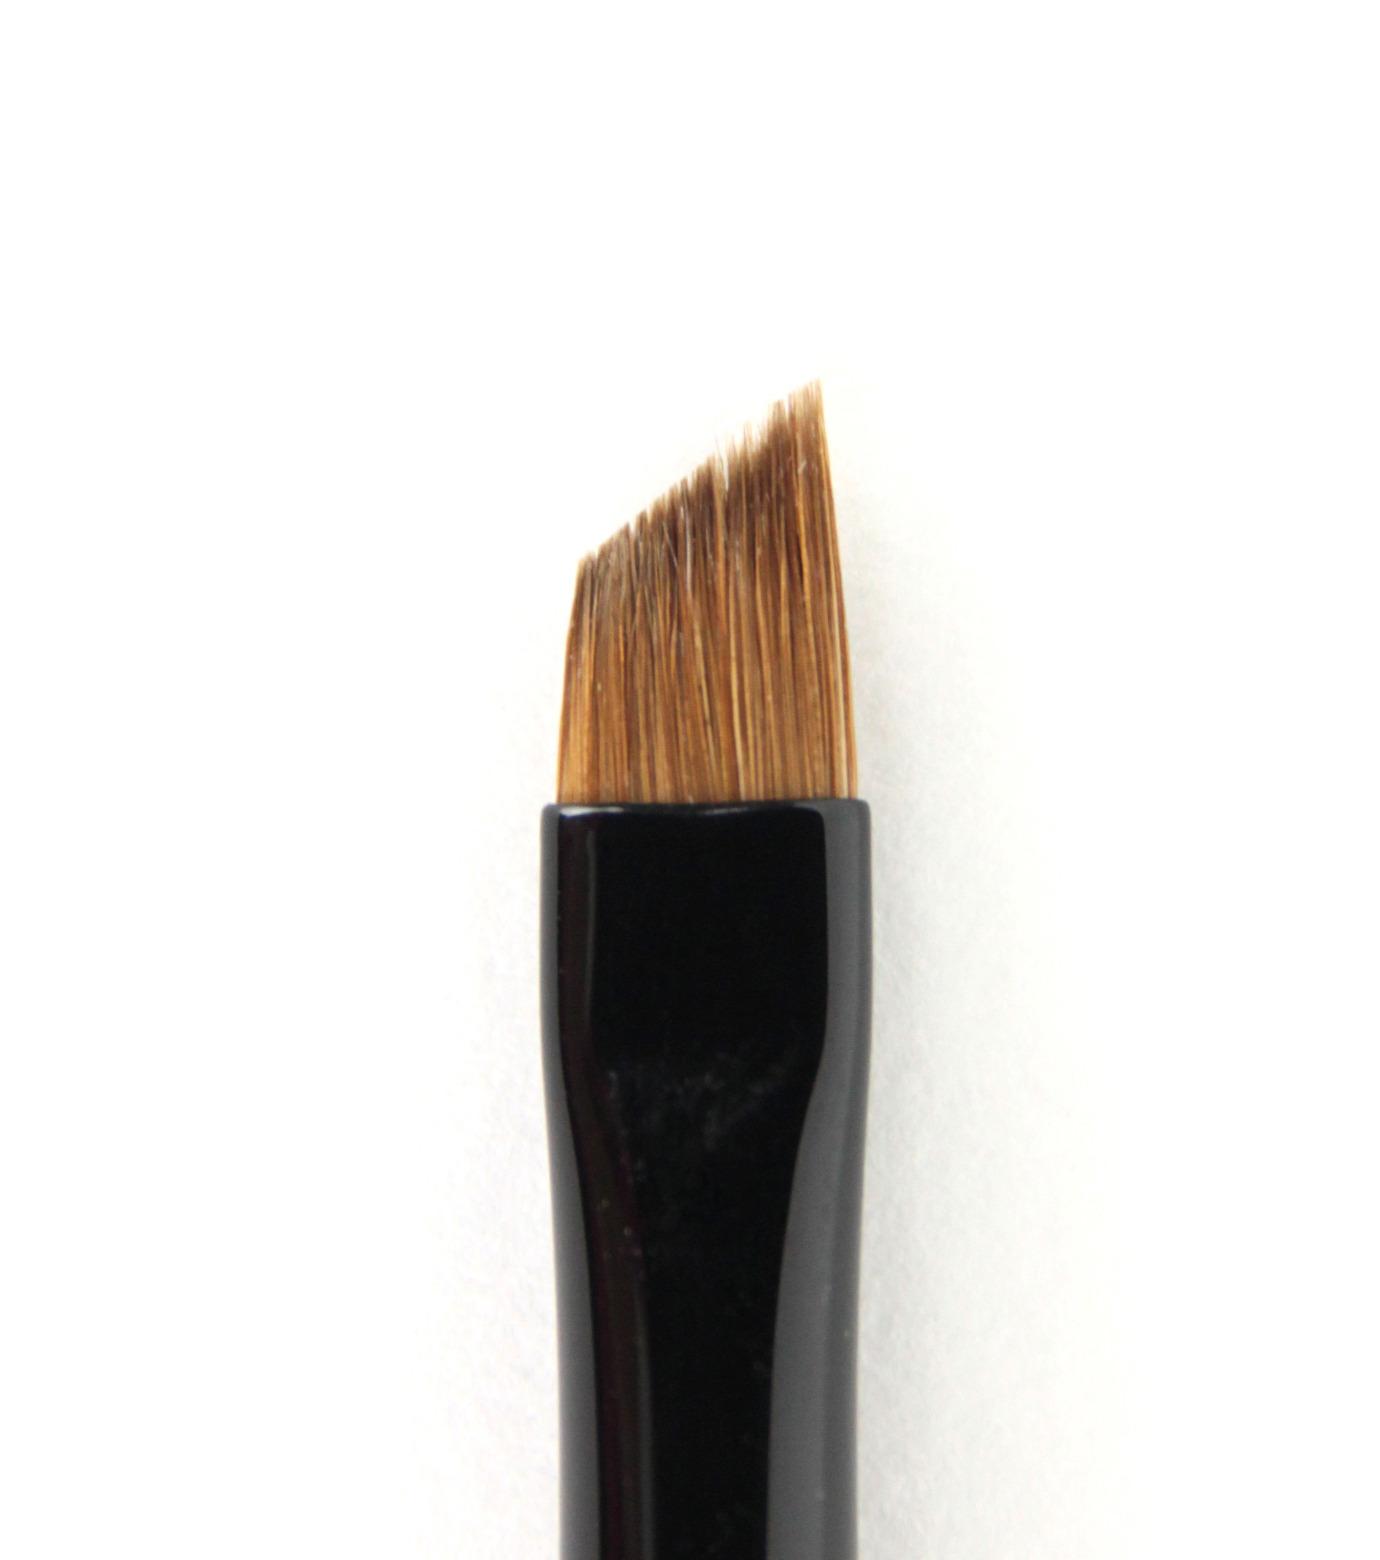 GRANJE(グランジェ)のGel Brush 5 French-BLACK(MAKE-UP/MAKE-UP)-914-13 拡大詳細画像1